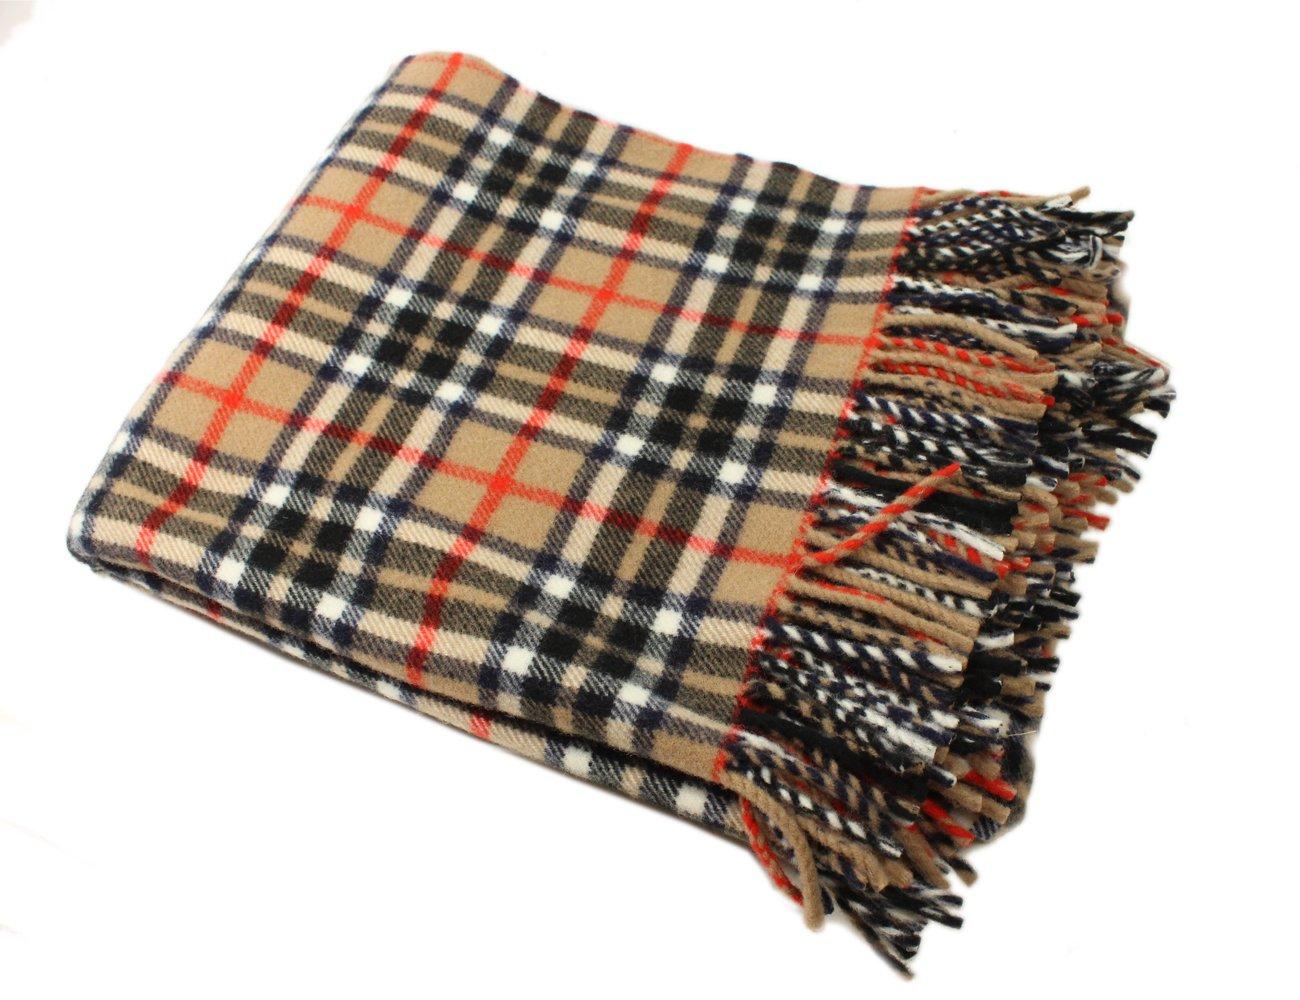 Tartan Blanket Thompson Design 52''x70'' 100% Wool Irish Made